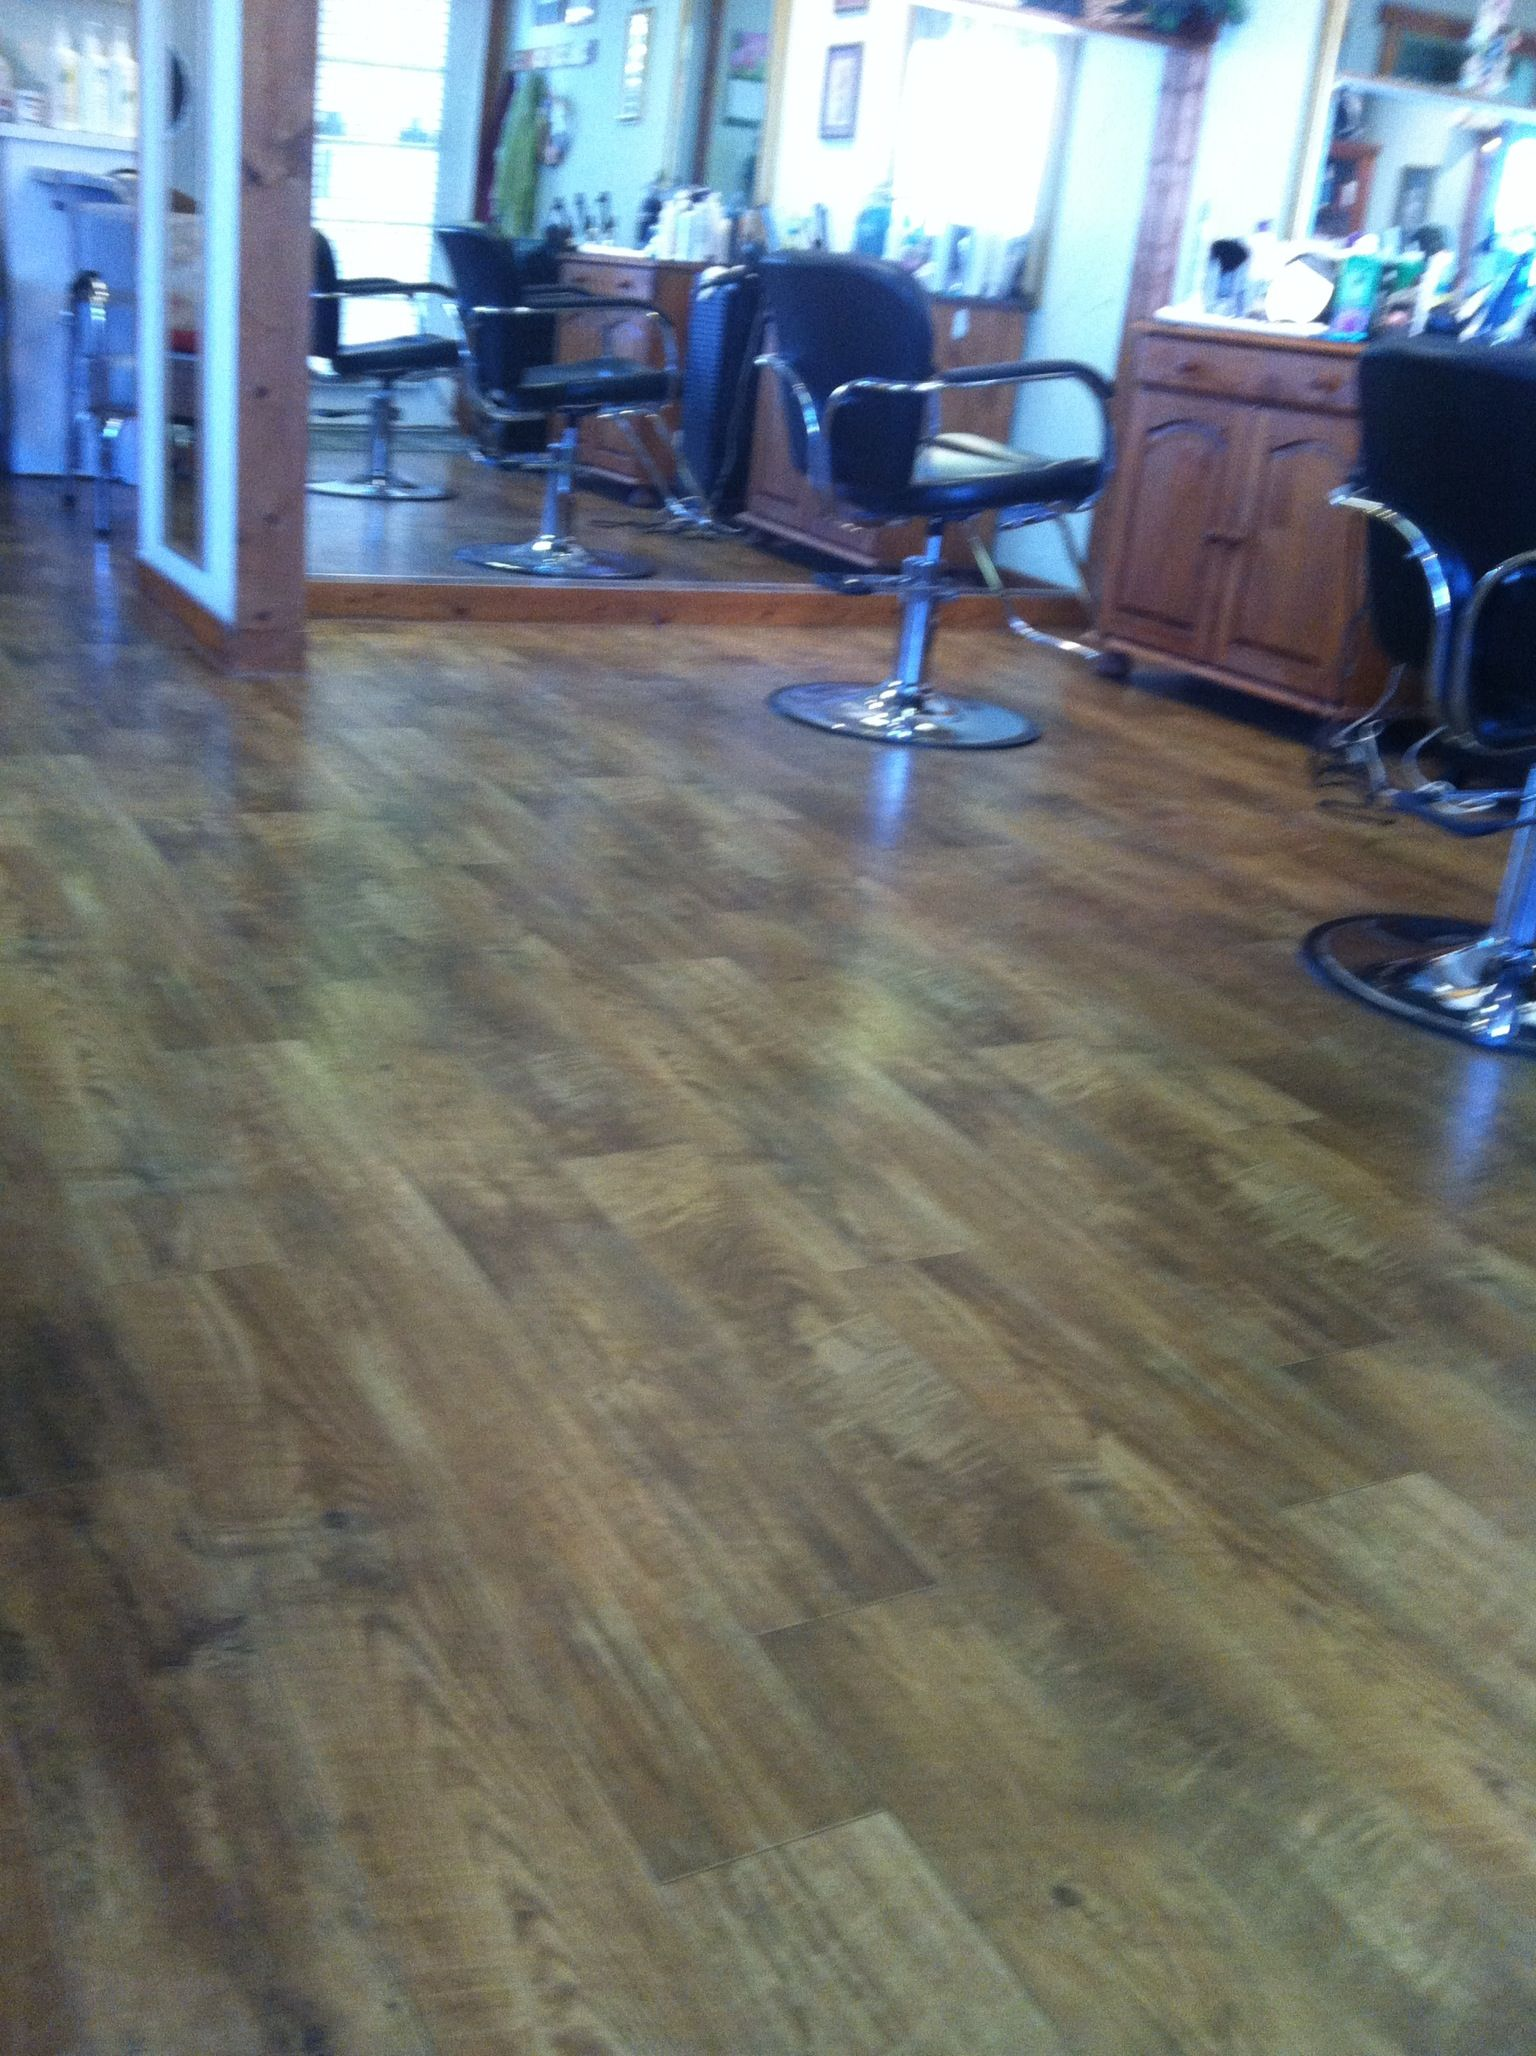 Amazing linoleum at my hair salon. Looks and feels like